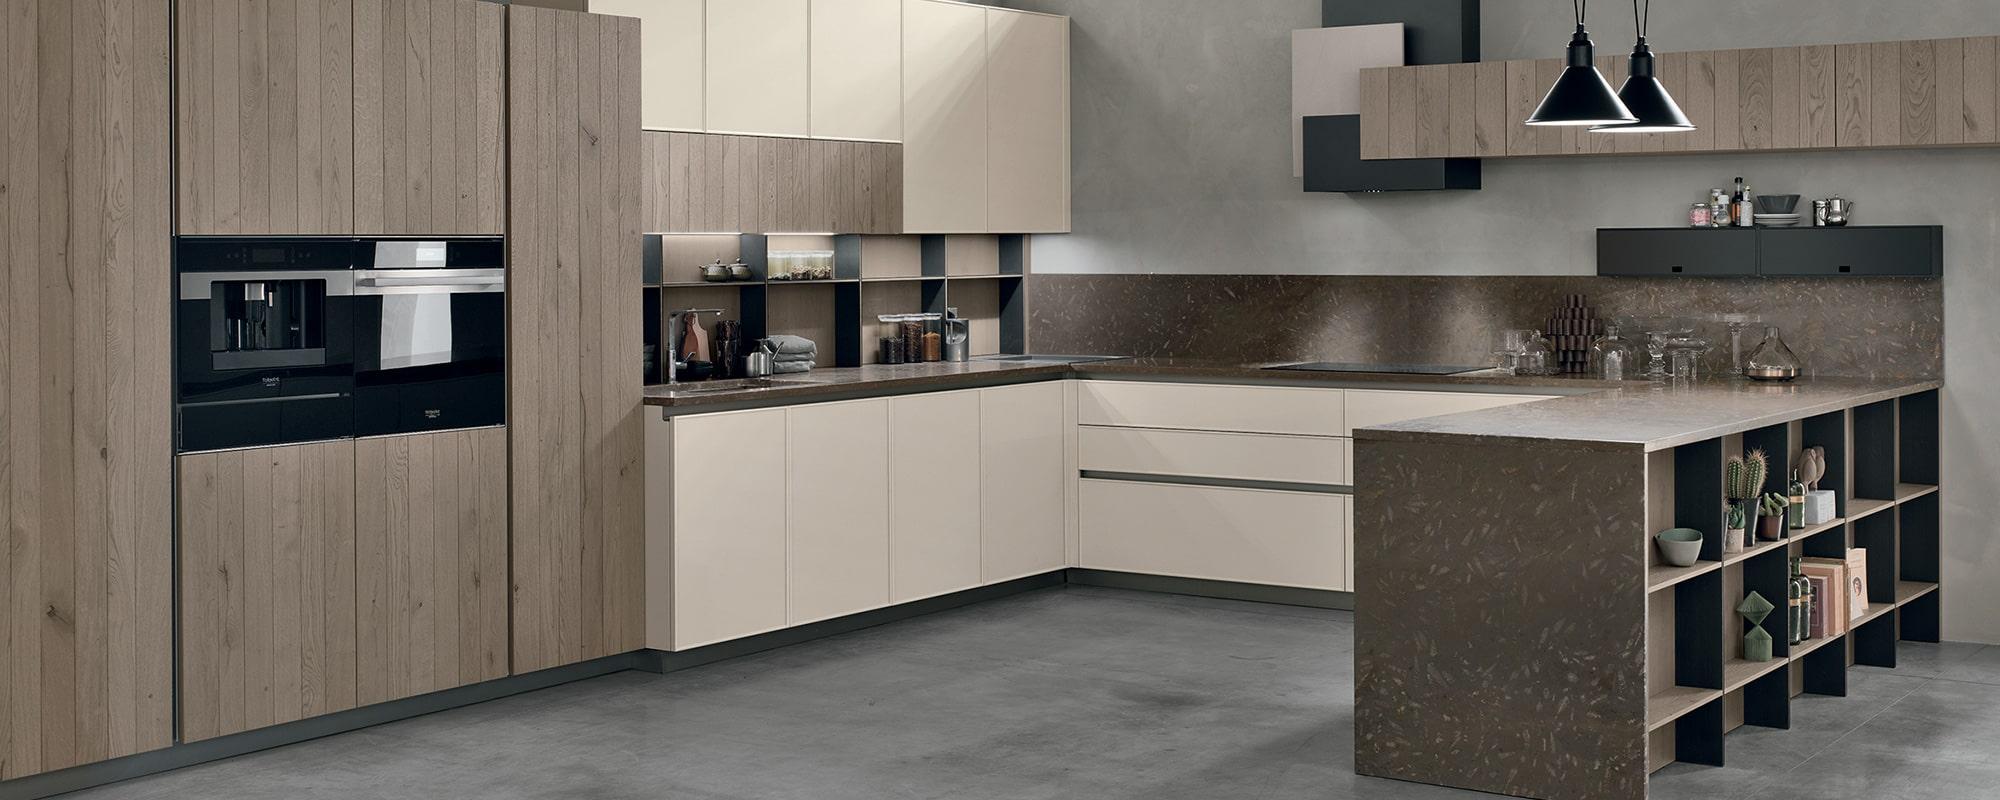 cucina-stosa-frame-stefano-arredamenti-lecce-3